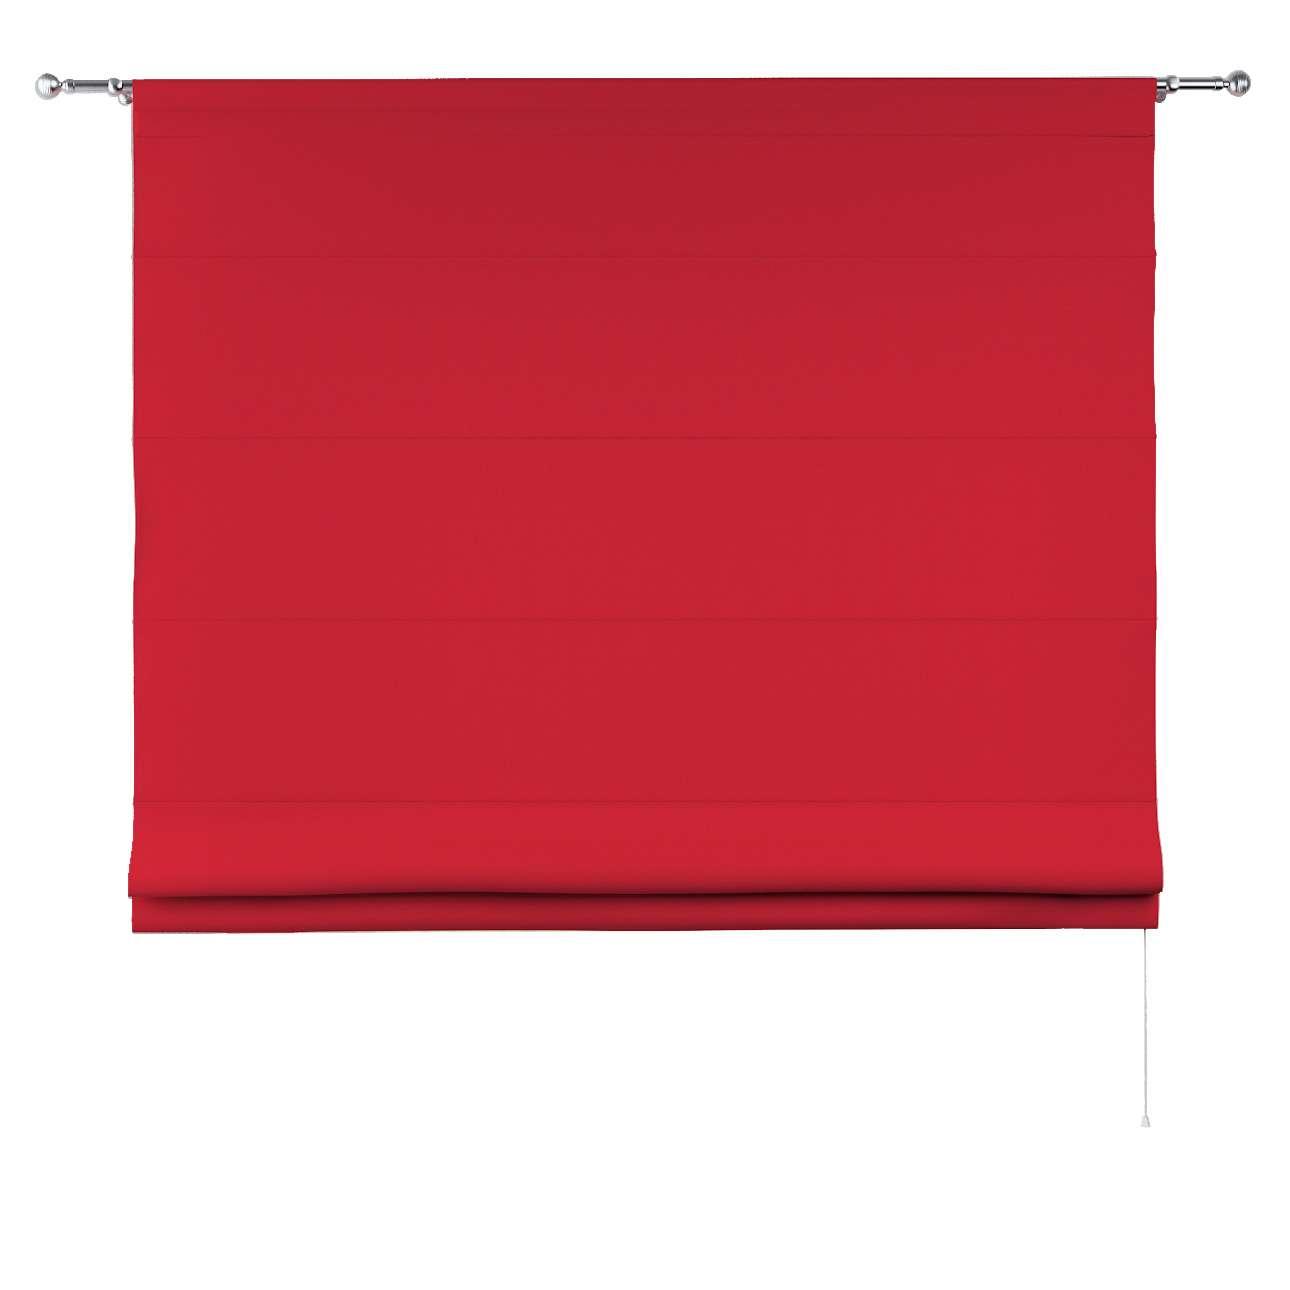 Roleta rzymska Torino w kolekcji Cotton Panama, tkanina: 702-04